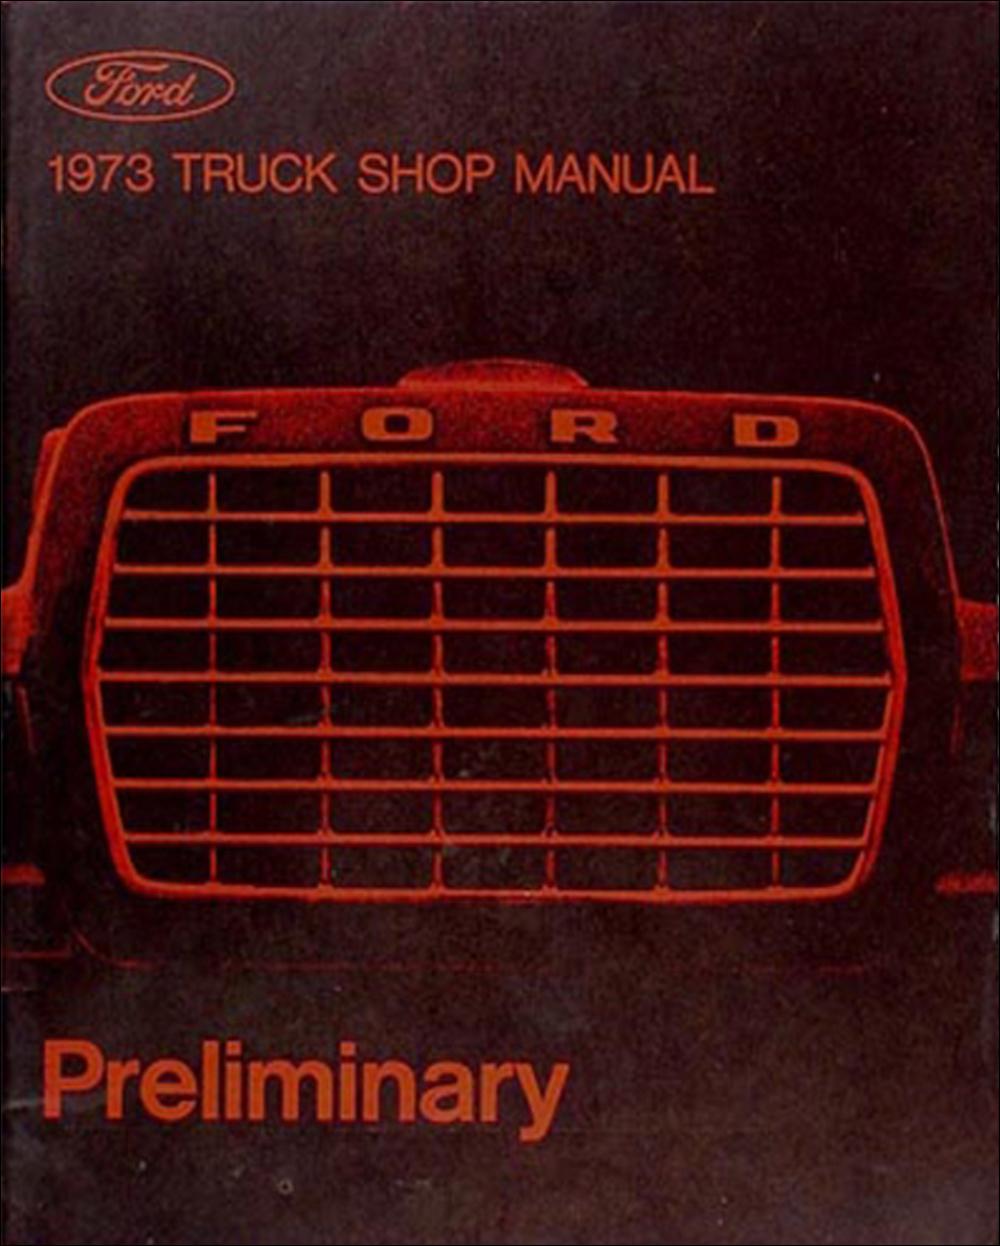 Ford F 350 Alternator Wiring Diagram Likewise 1973 Ford F 250 Wiring